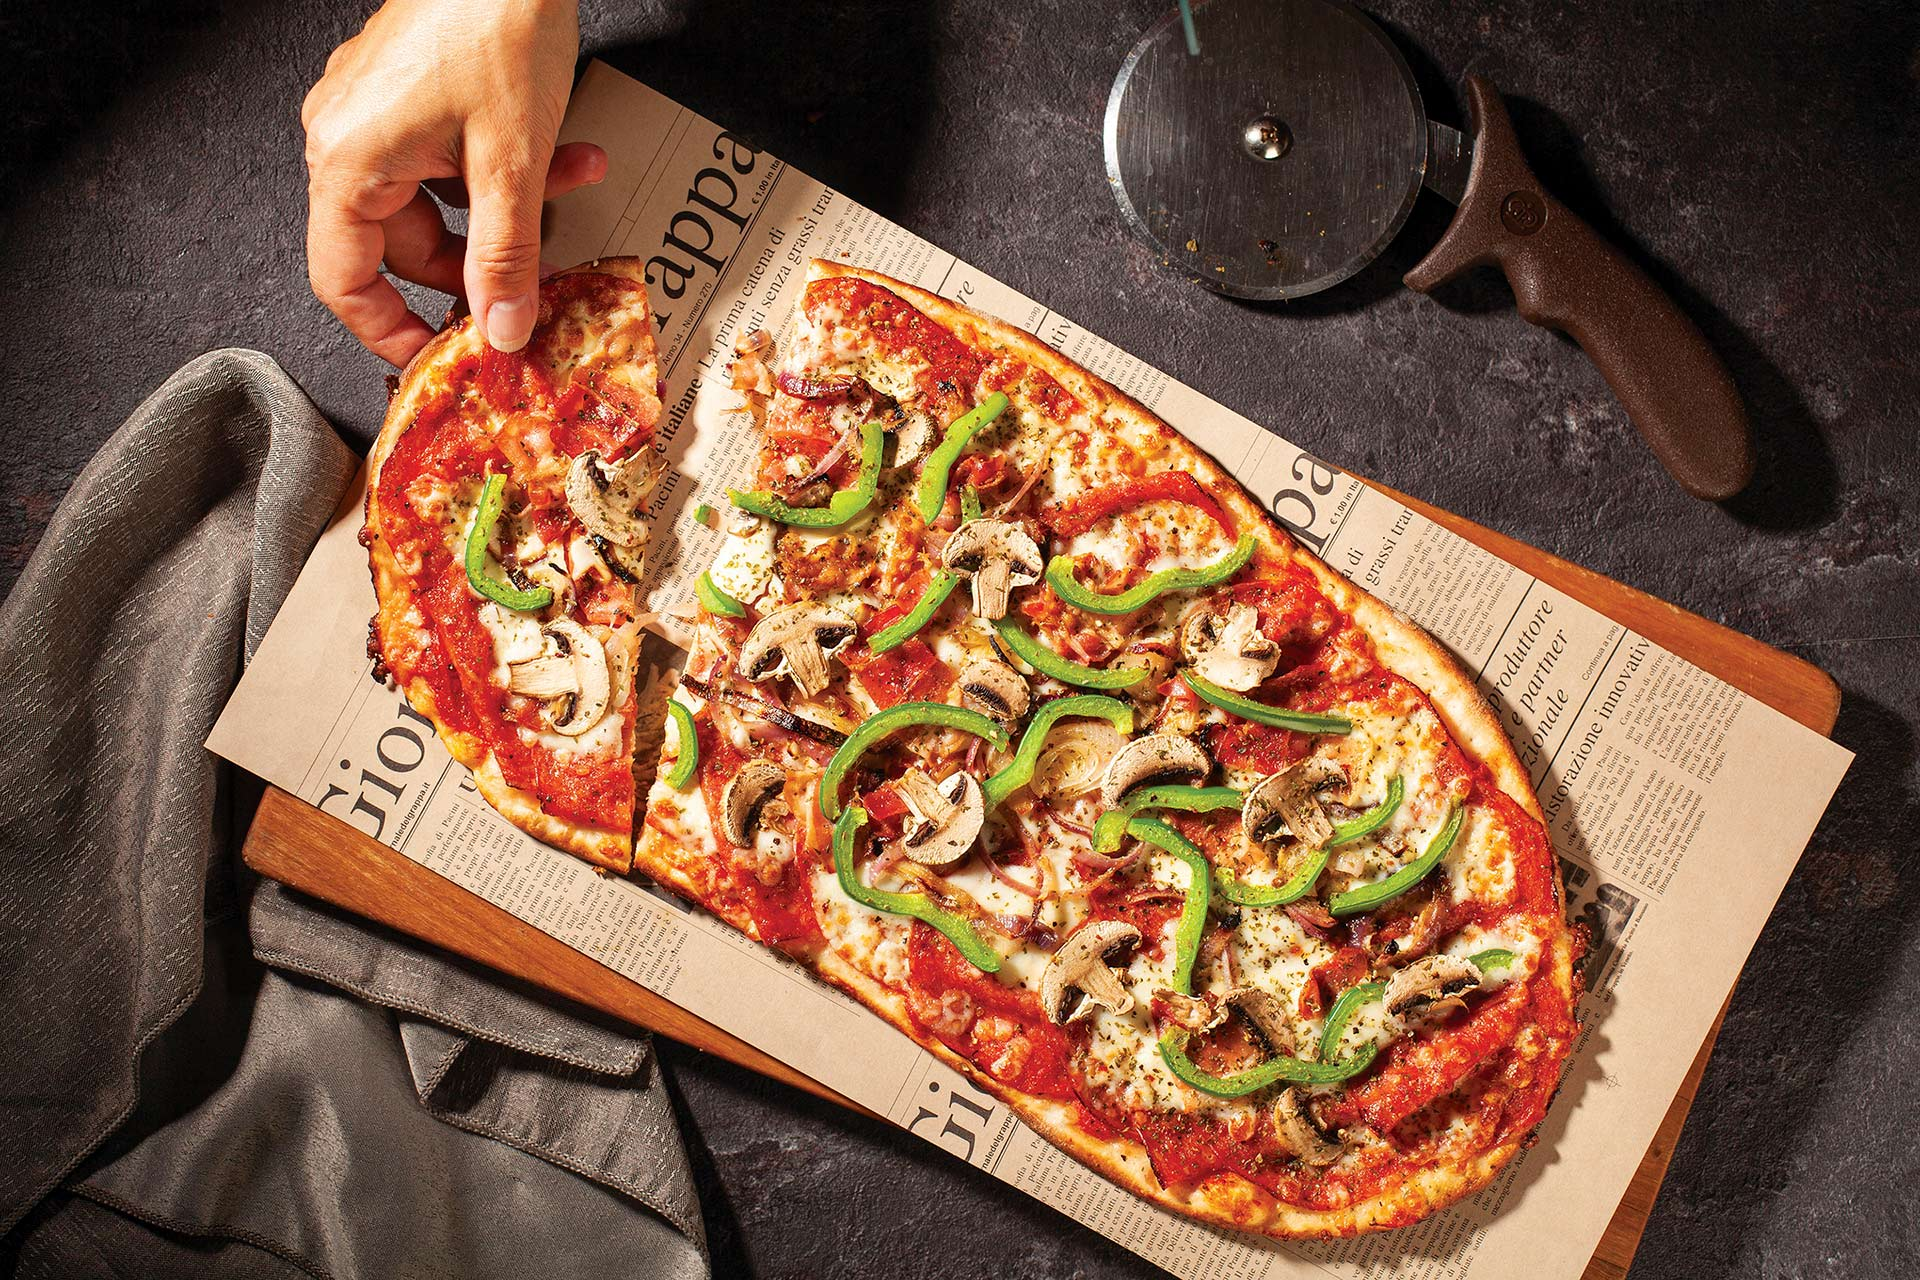 Pacini restaurant italien - Pizza Americana de la Maison